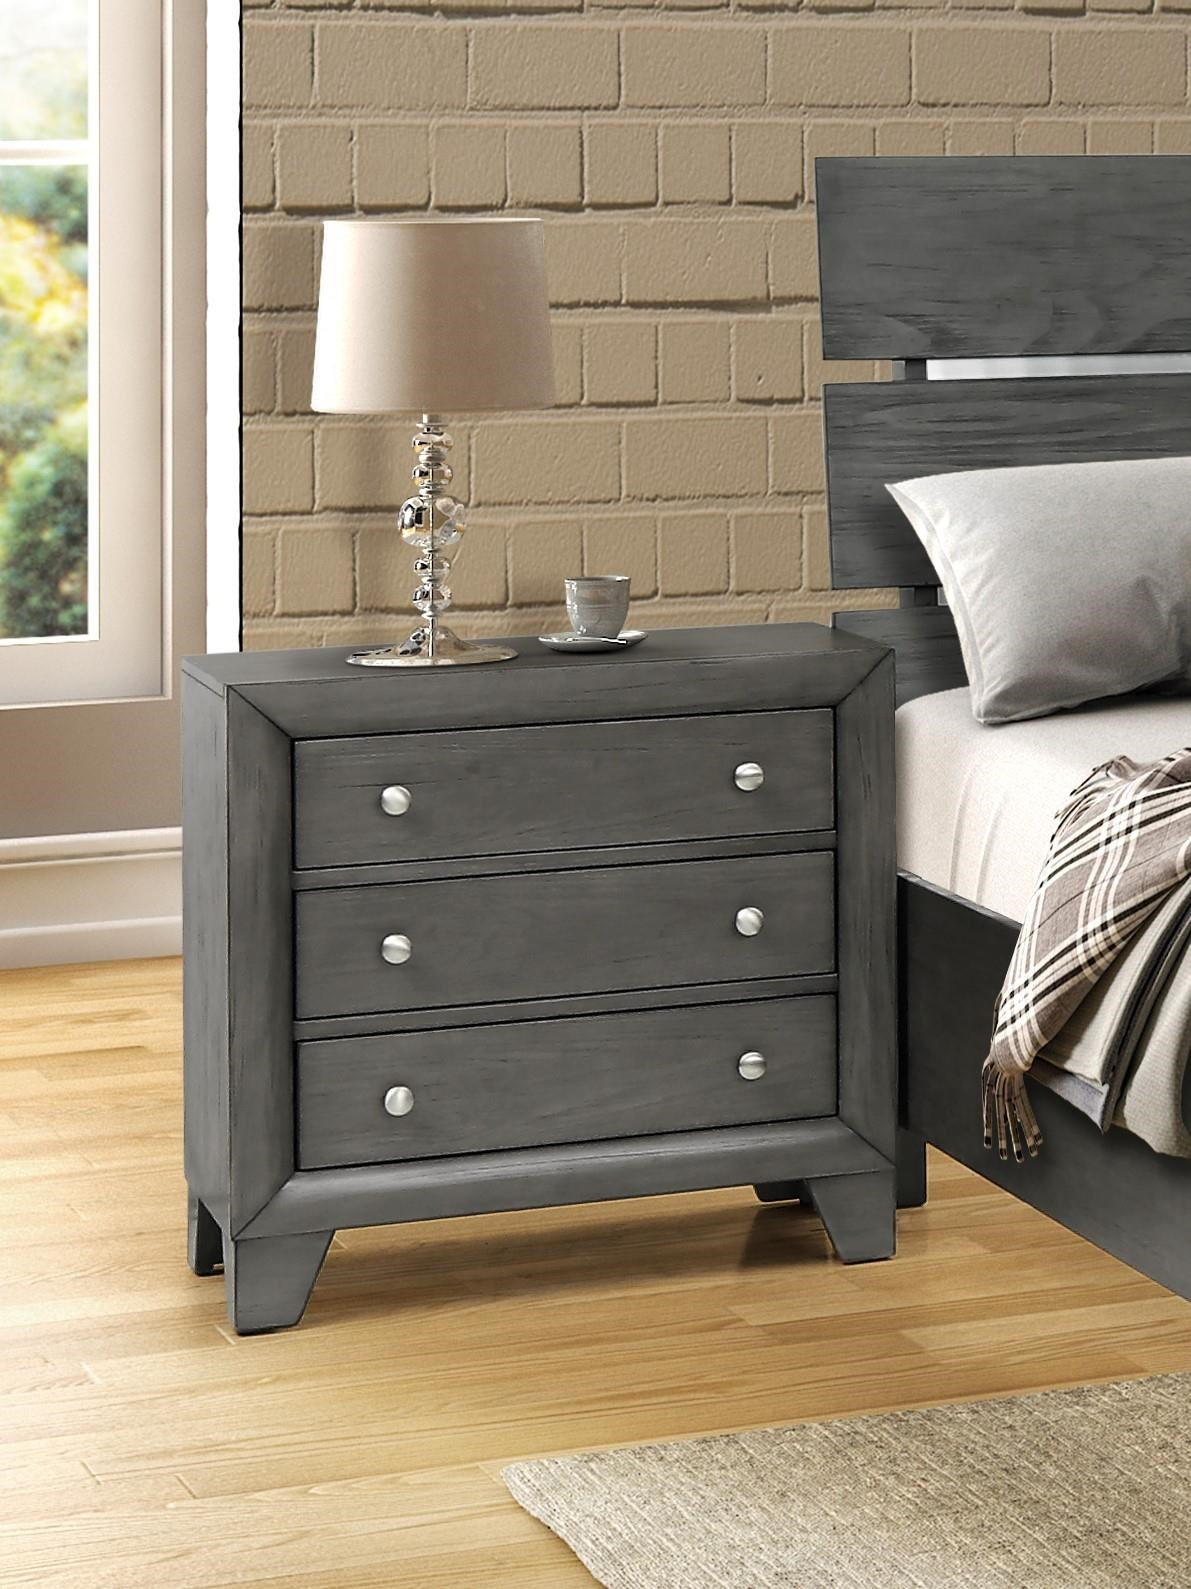 8130G Three Drawer Nighstand by Lifestyle at Furniture Fair - North Carolina